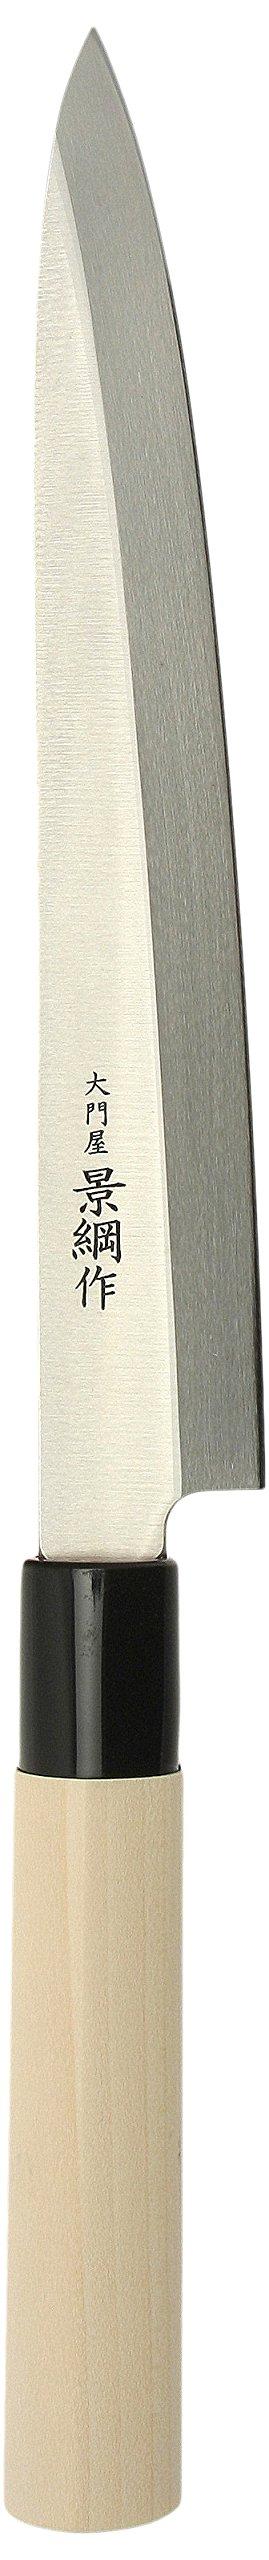 Kotobuki Kagetsuna Yanagi Japanese Kitchen Knife